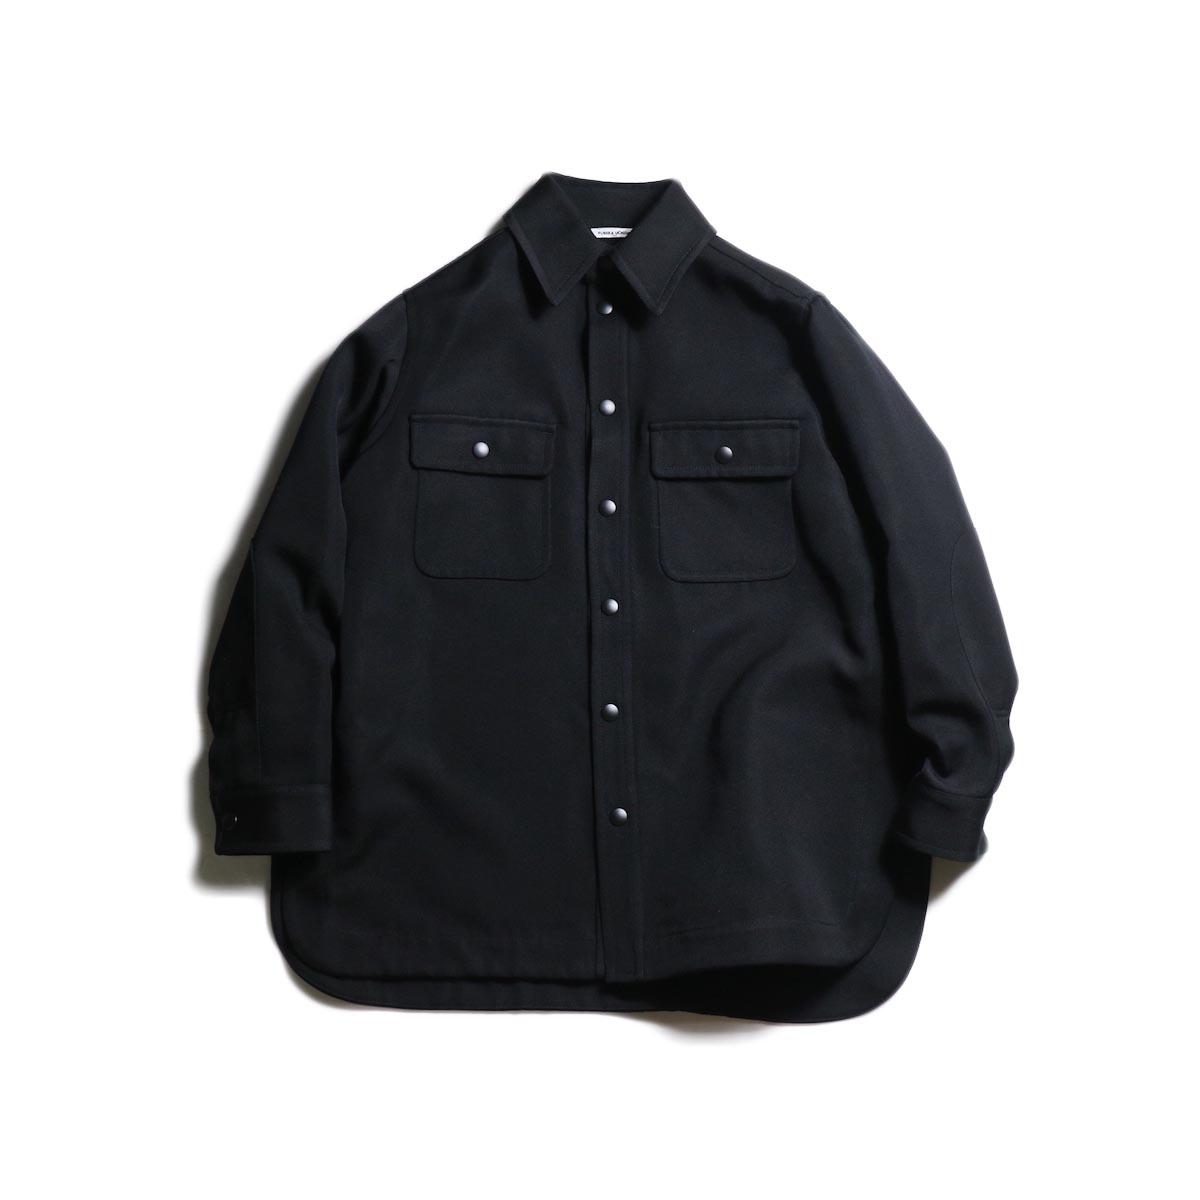 FUMIKA UCHIDA / Wool/Poli Tricotine Shirt Jacket (Black)